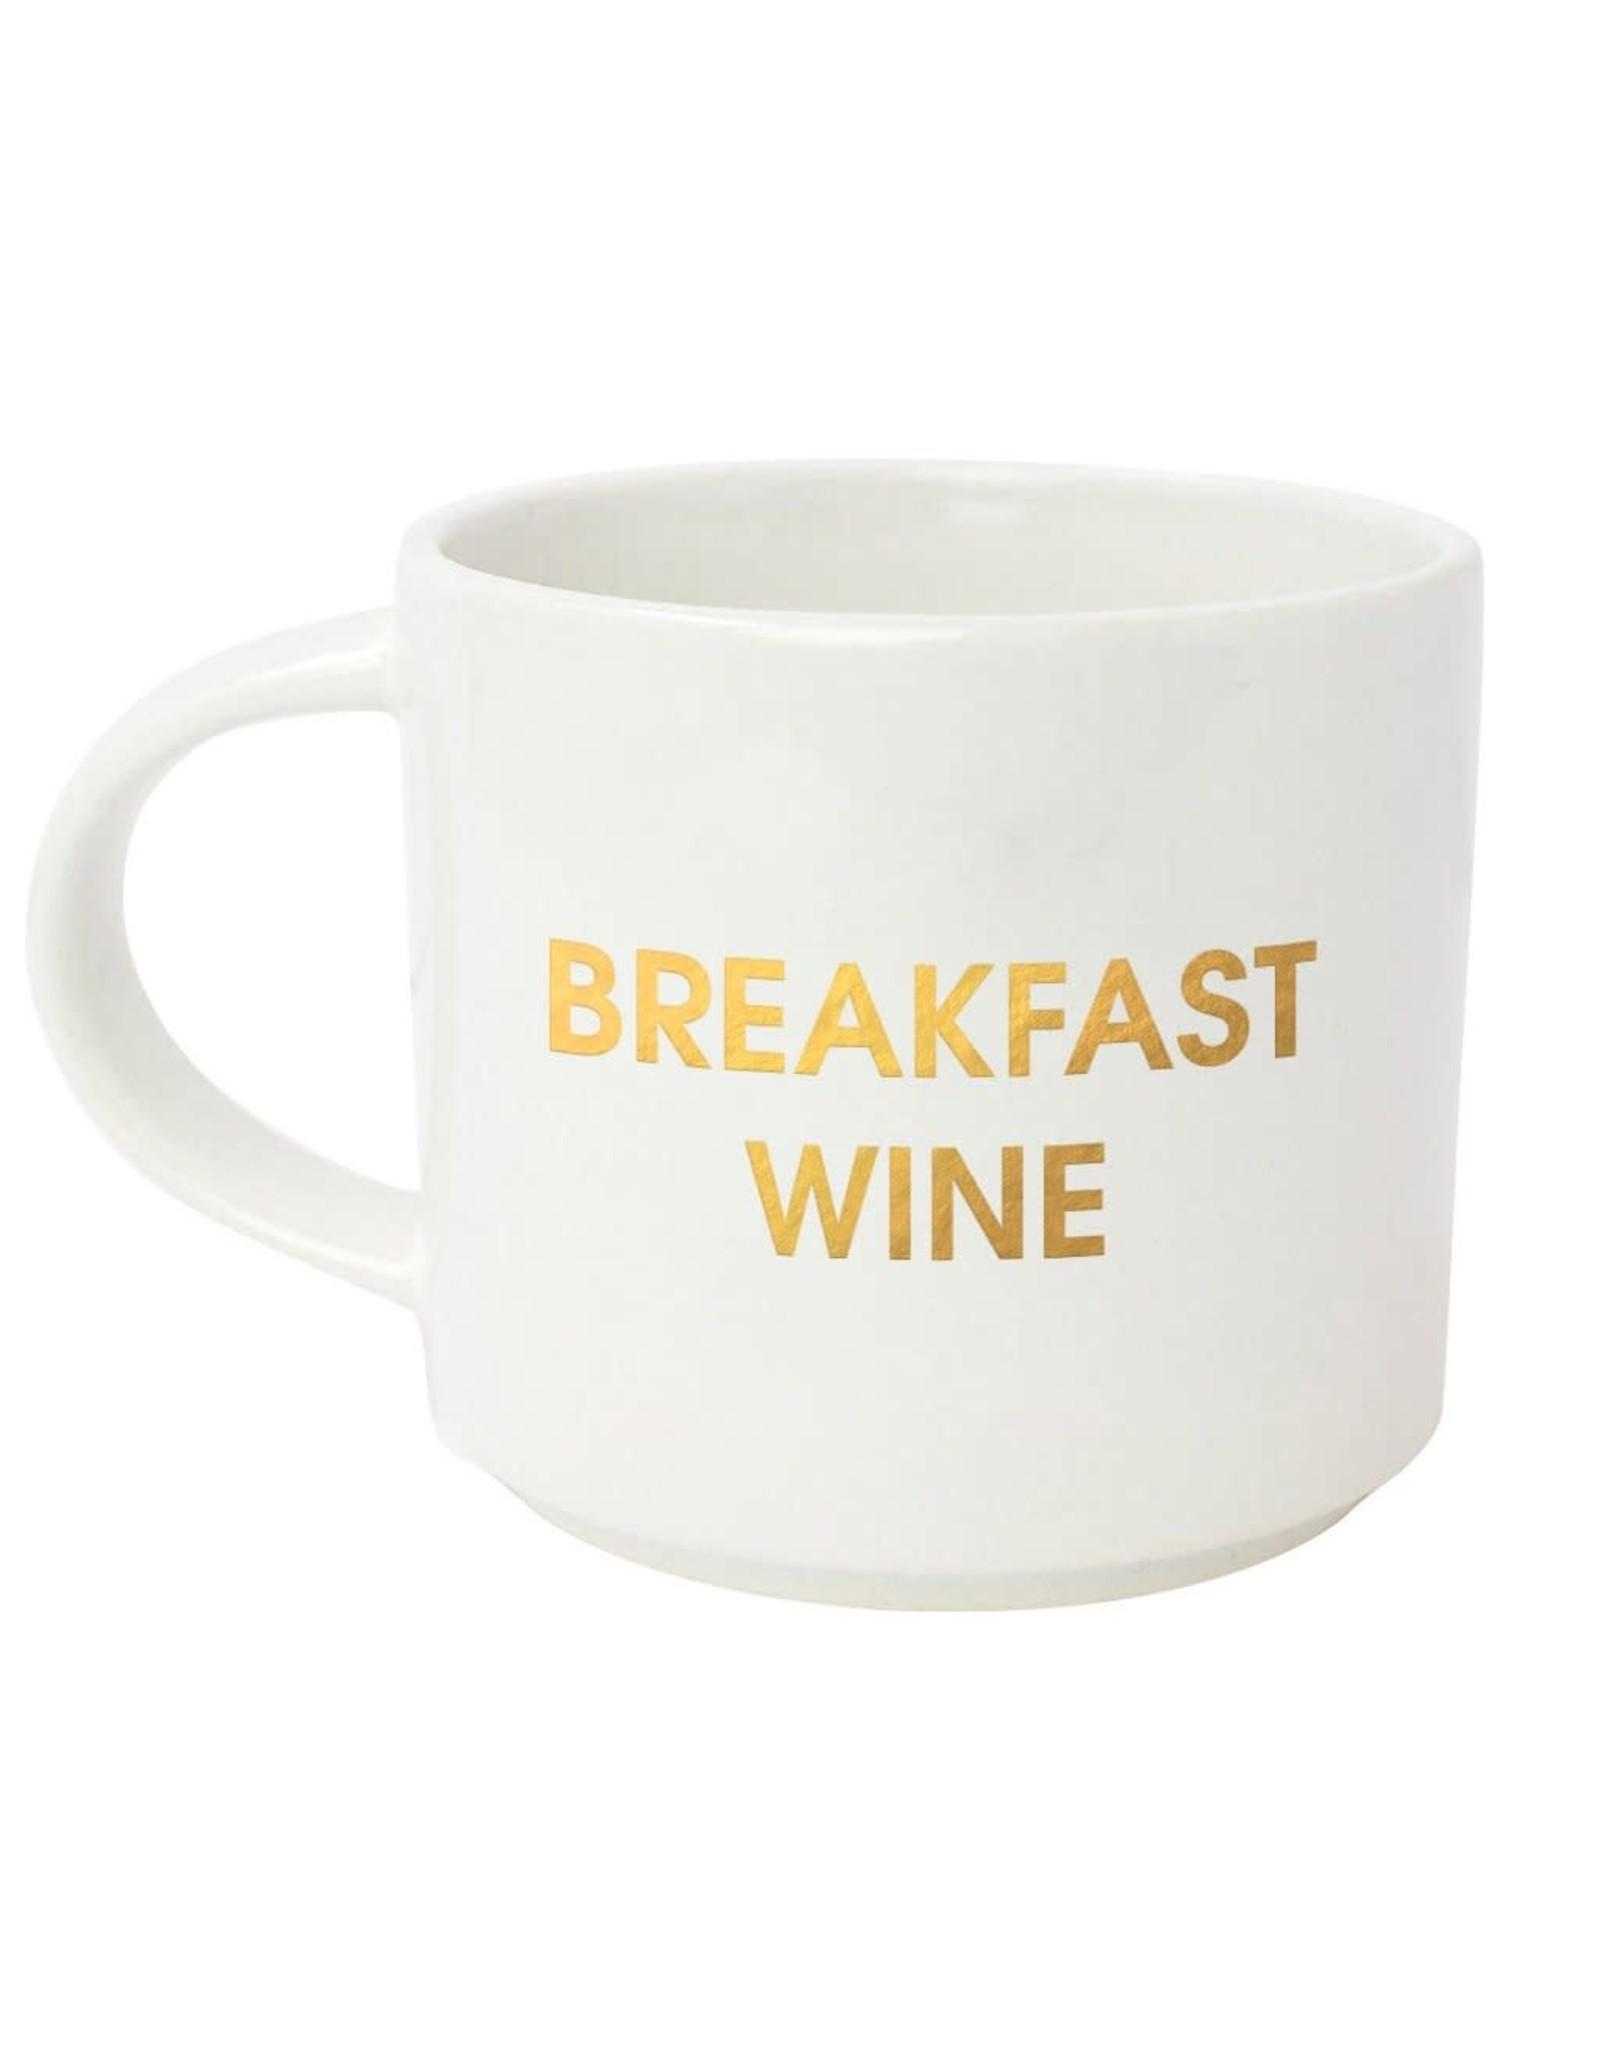 Chez Gagne Breakfast Wine - Mug